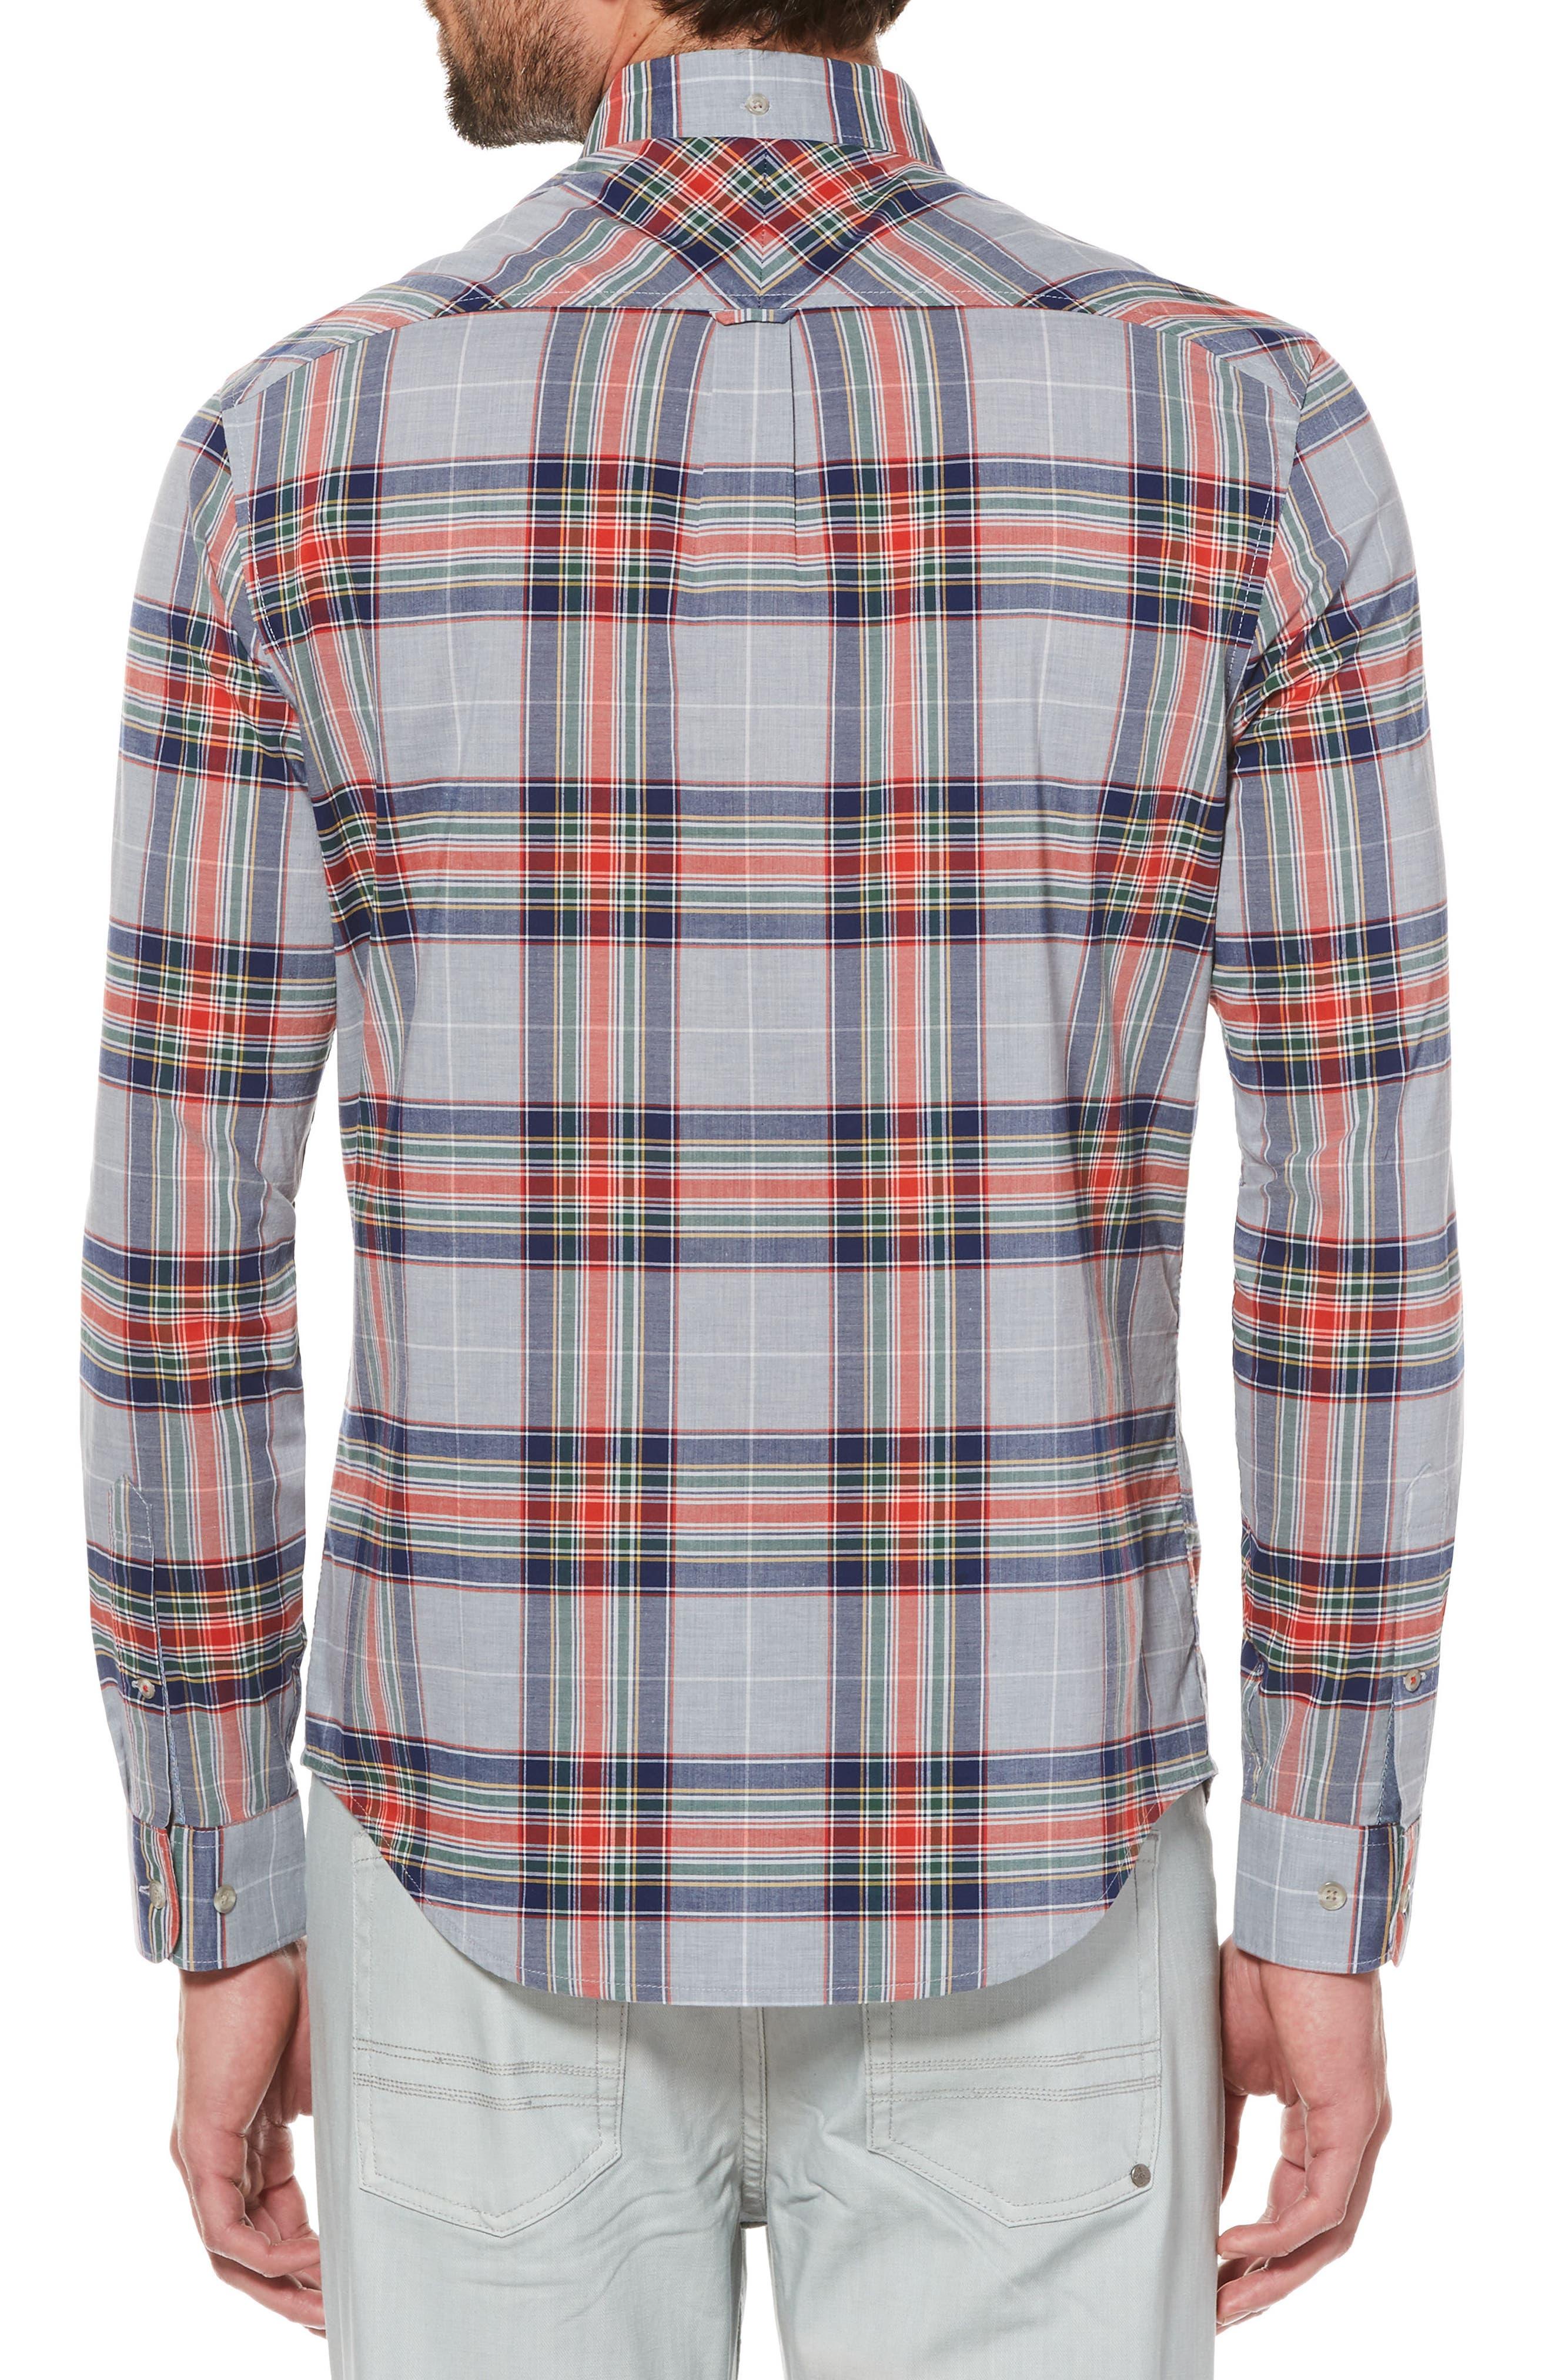 P55 Heritage Slim Fit Plaid Shirt,                             Alternate thumbnail 2, color,                             Athletic Grey